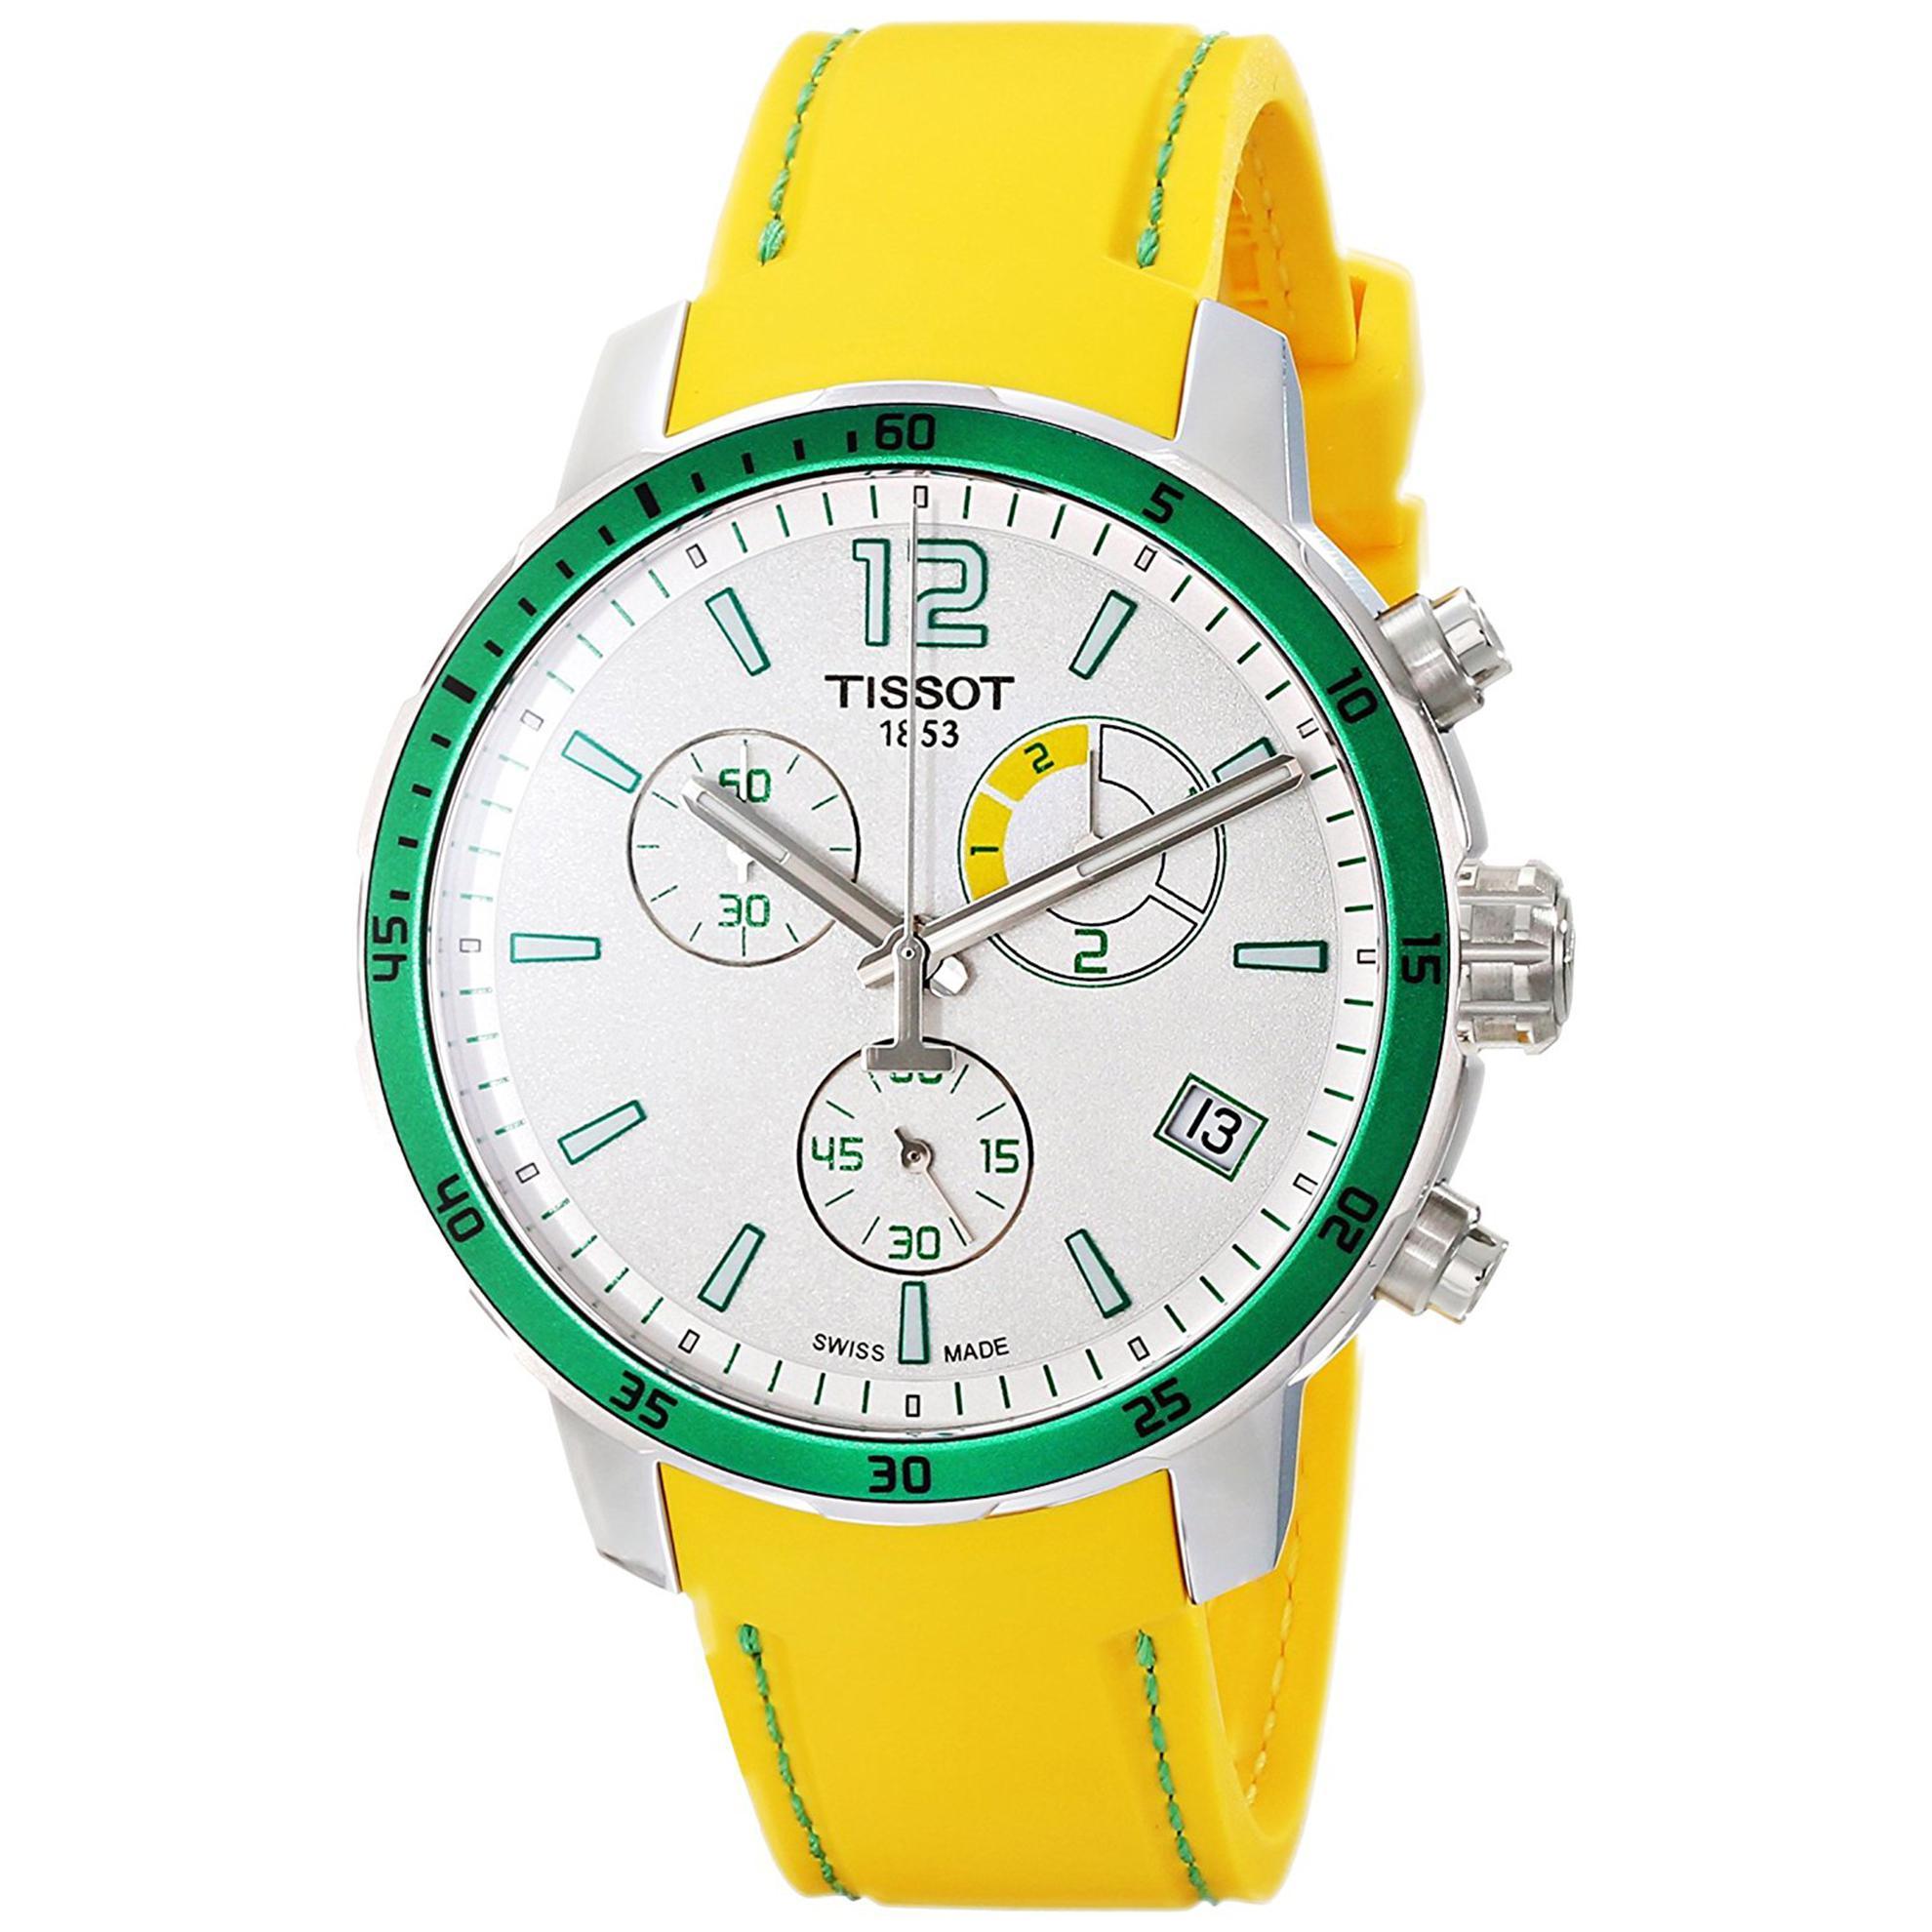 Tissot T0954491703701 Tissot Quickster Chronograph Green Bezel Silver Dial Yellow Strap